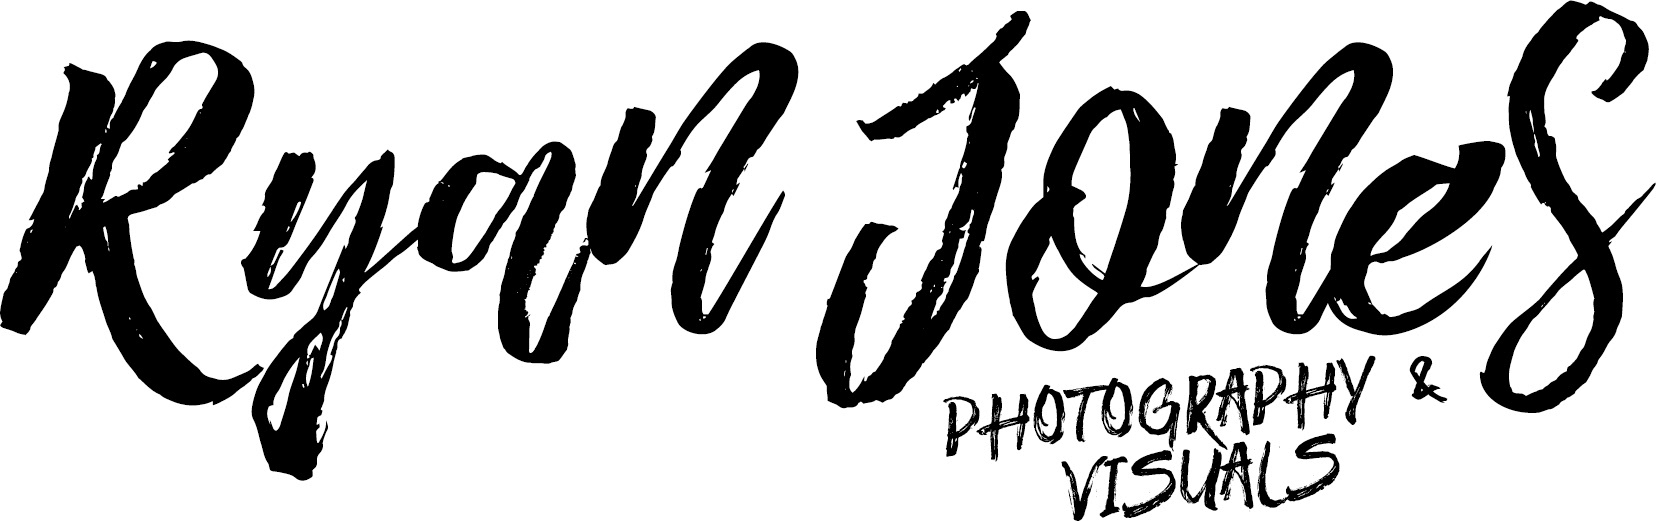 Ryan Jones Photography & Visuals